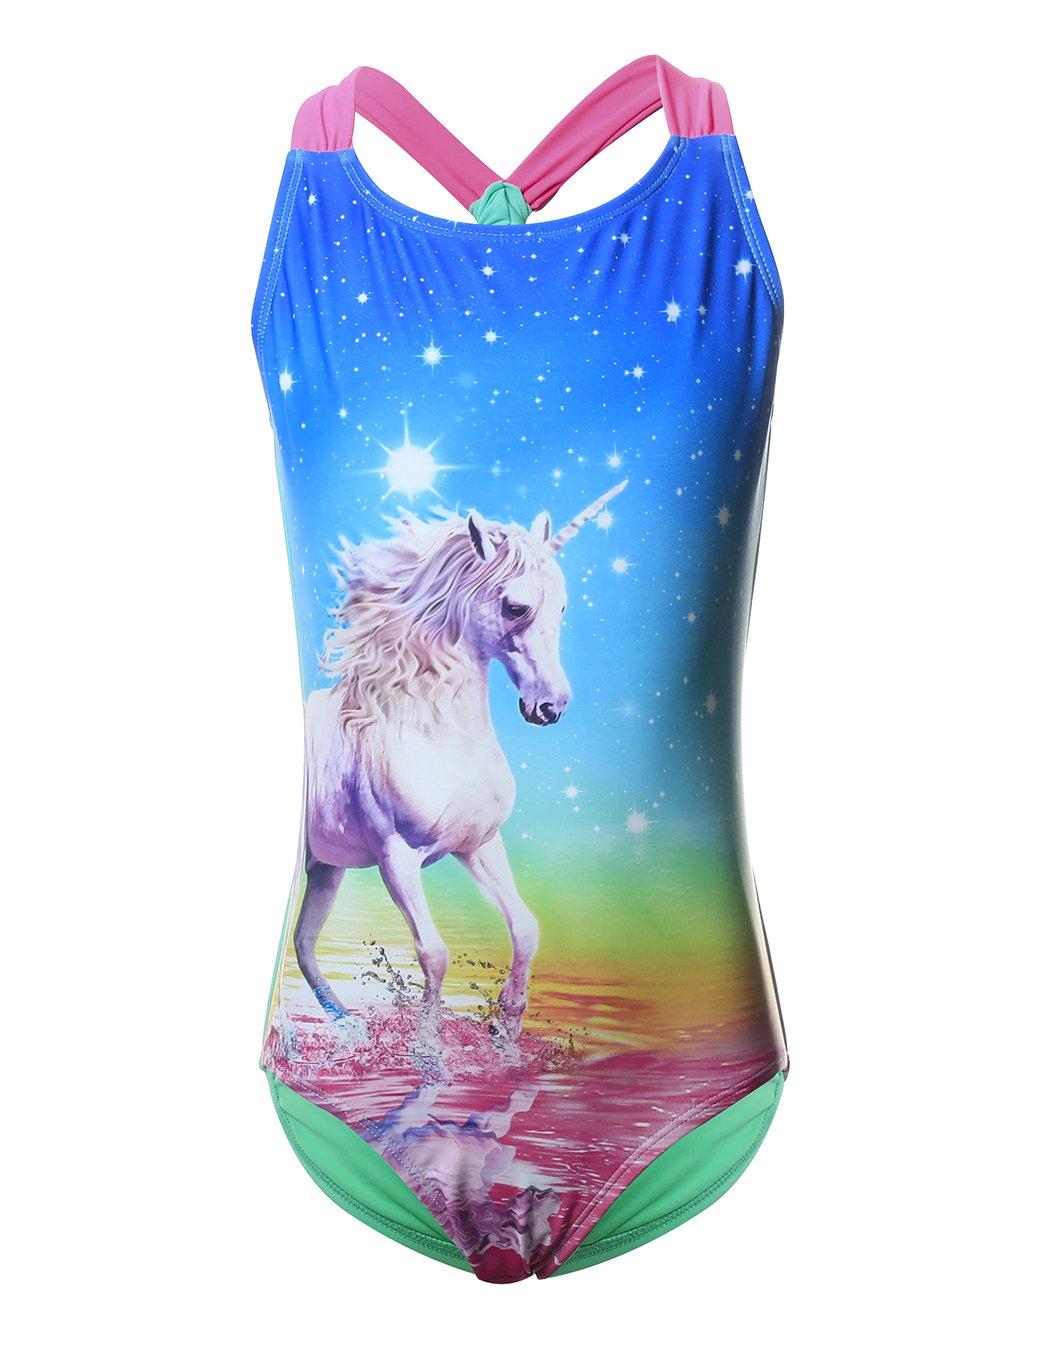 Unicorn Swimwear for Girls, One Piece UPF 50+ Swimsuit Racerback Beach Bathing Suits